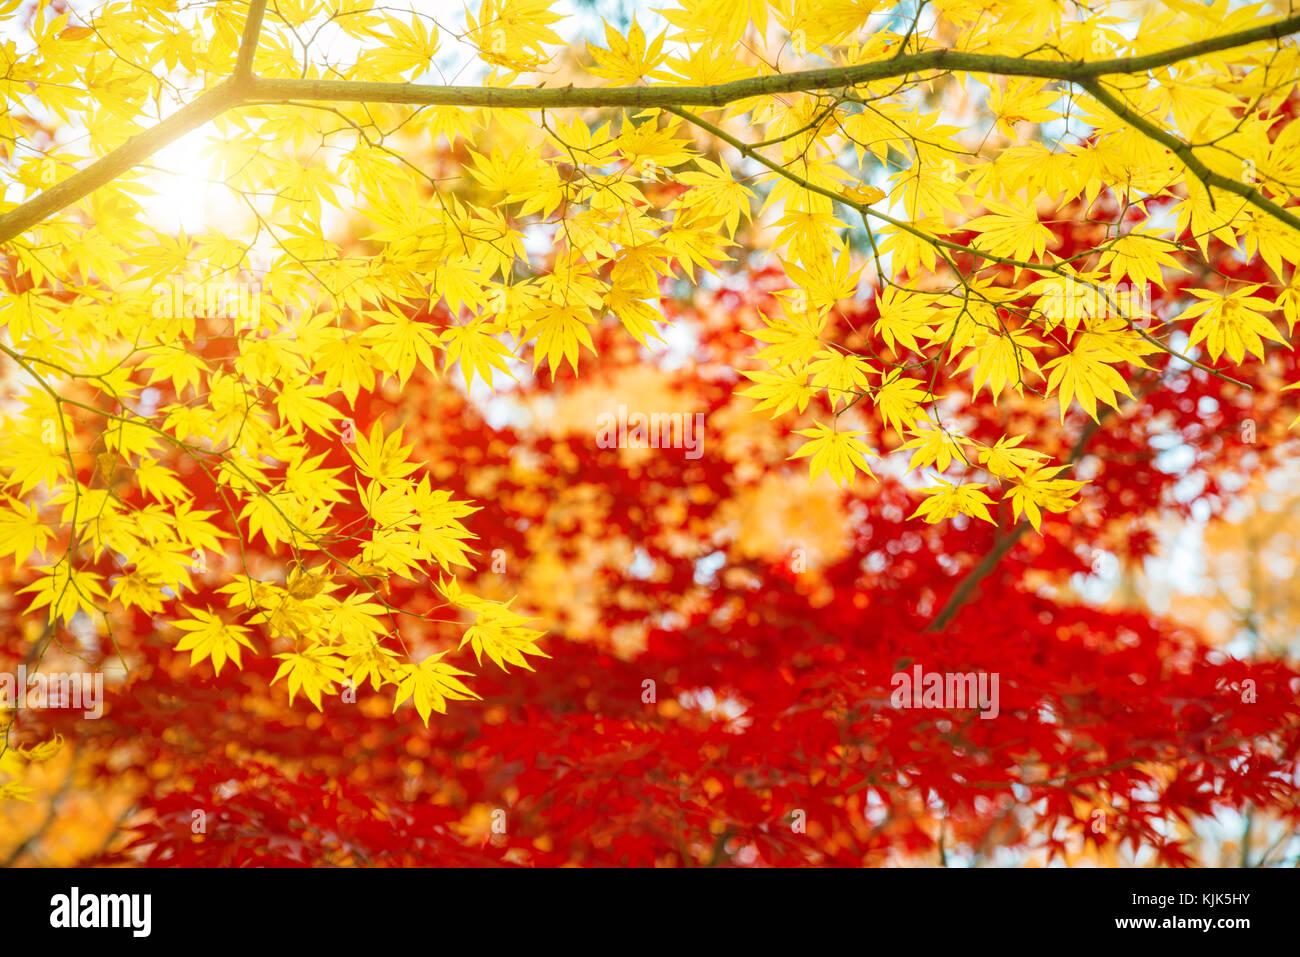 autumn photos autumn images alamy. Black Bedroom Furniture Sets. Home Design Ideas